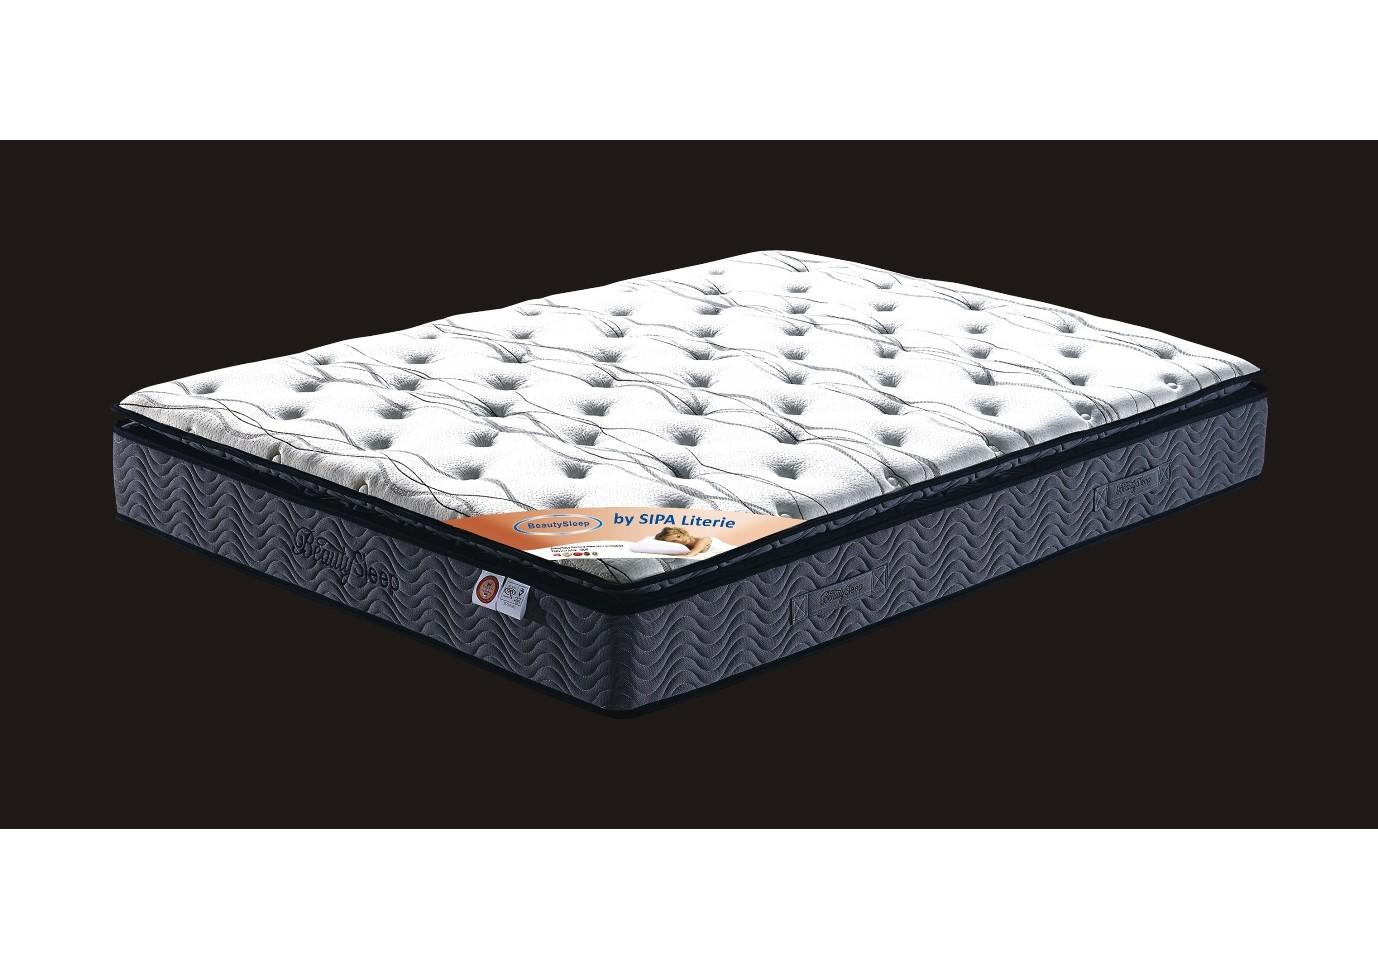 matelas ressorts beauty sleep 140 x 190 cm literie. Black Bedroom Furniture Sets. Home Design Ideas